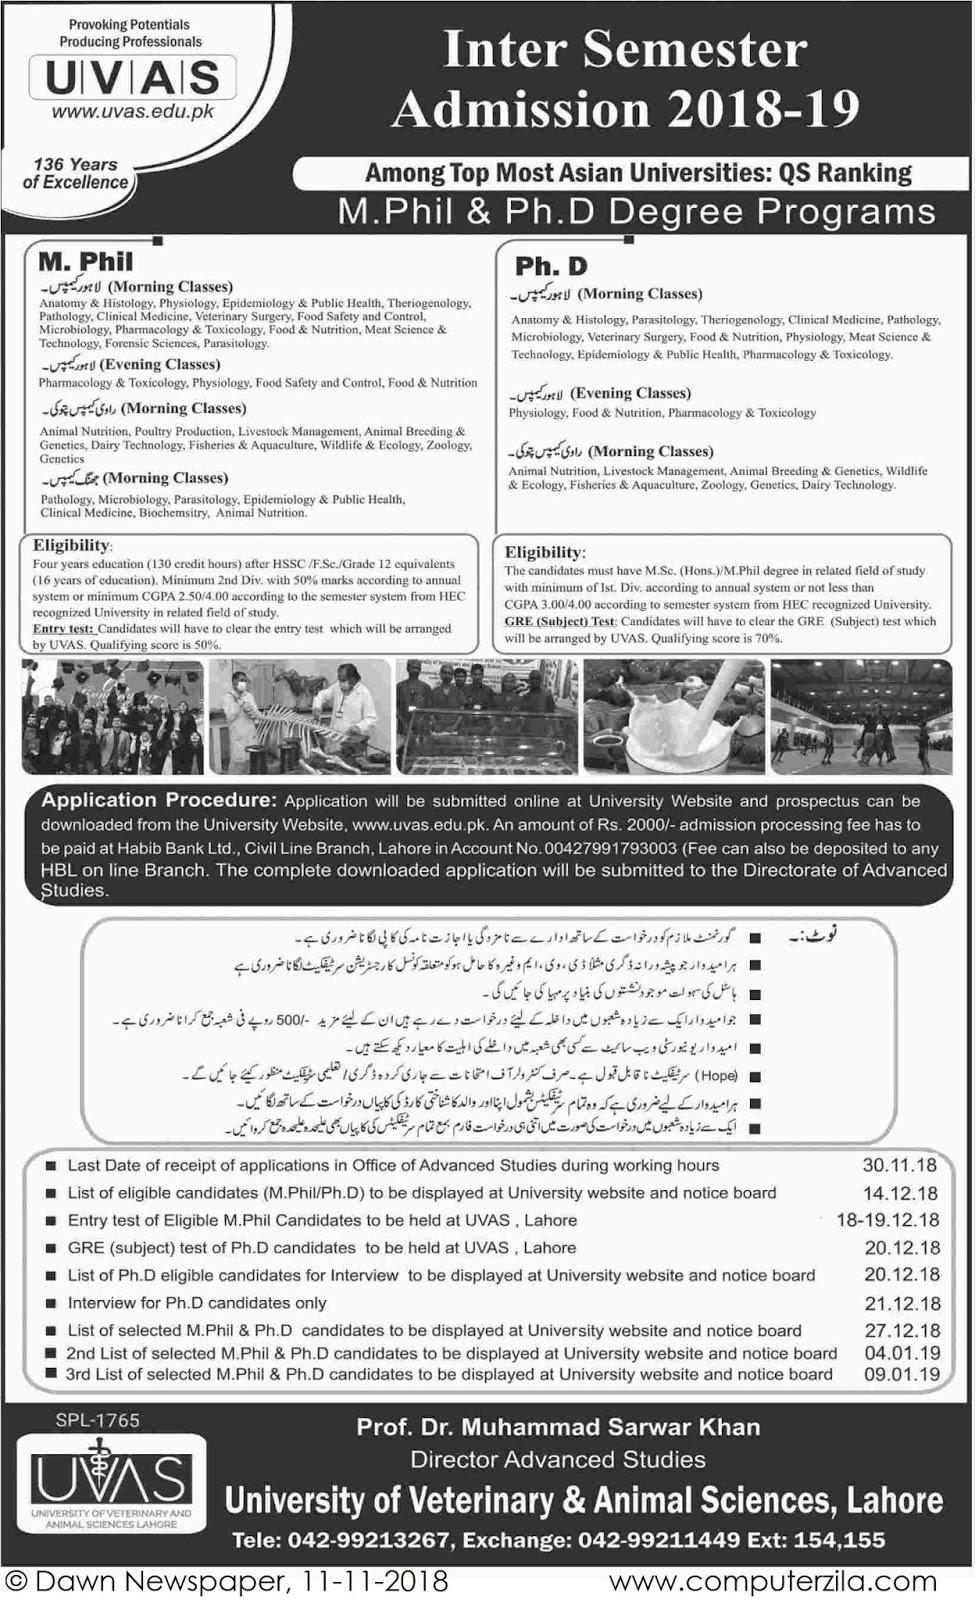 Admissions Open For Spring 2018 At UVAS Lahore Campus